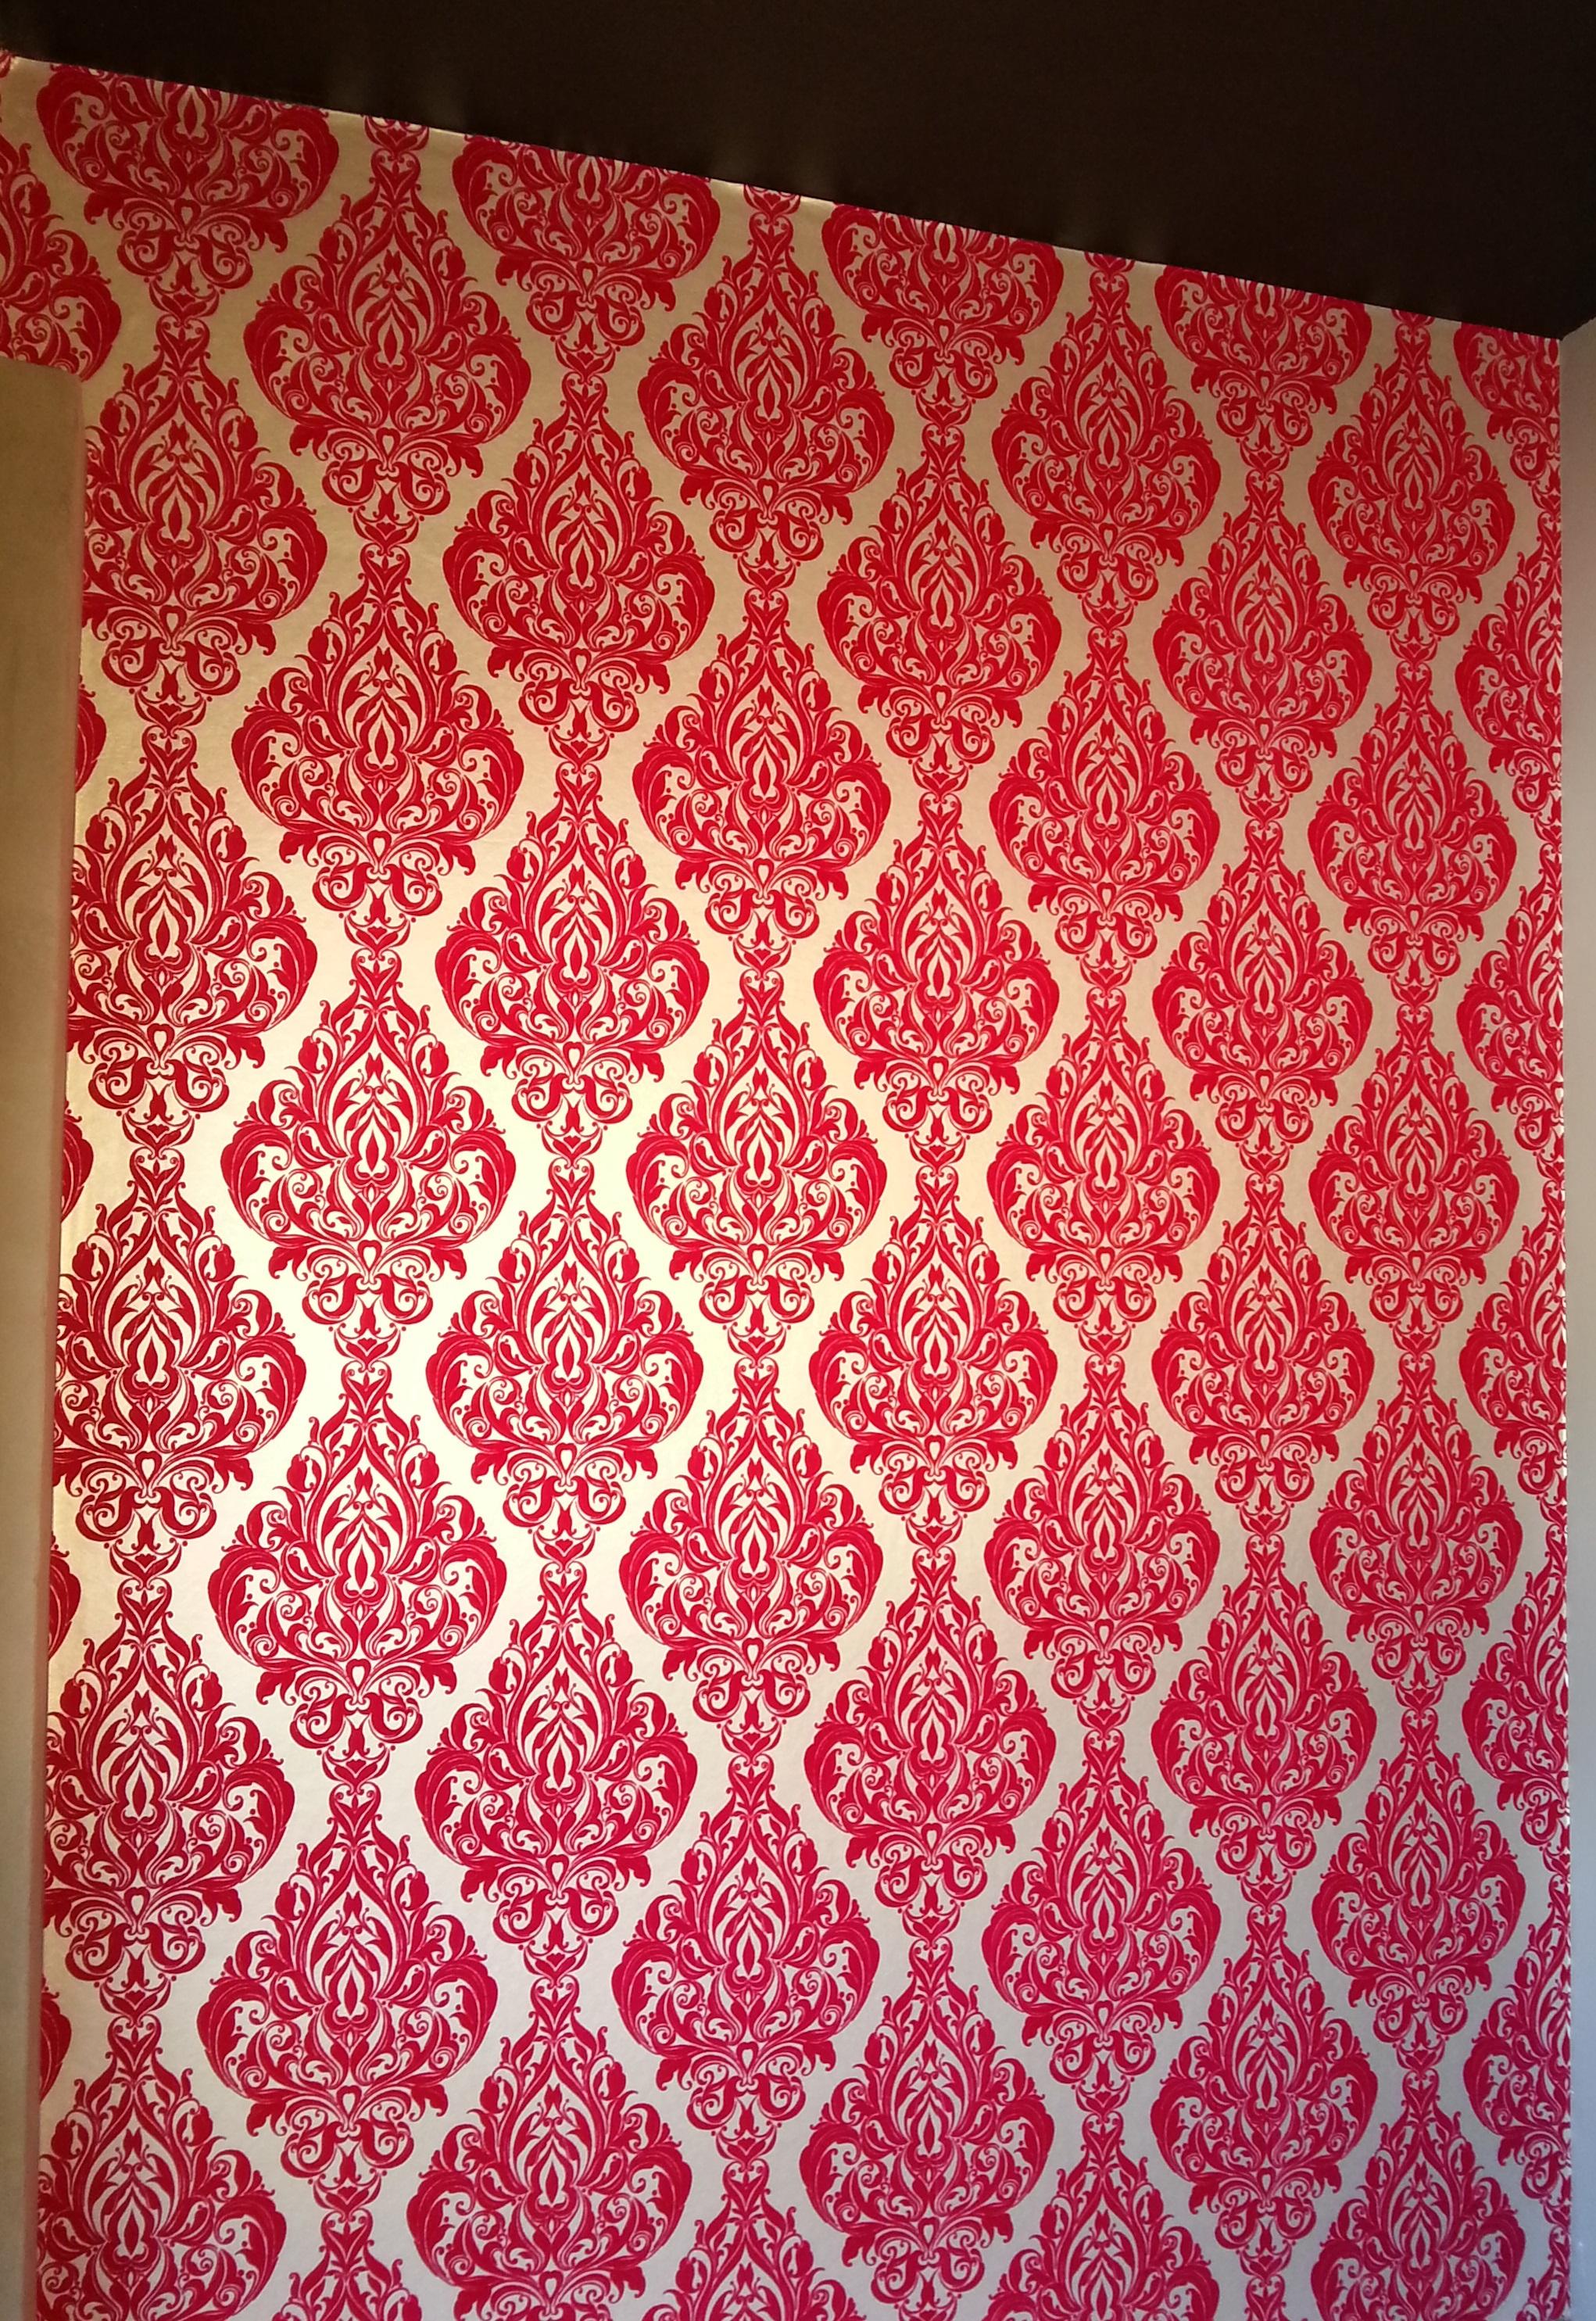 Elegant-Red-Flock-Installation-by-Sydney-Wallp-wallpaper-wp5007085